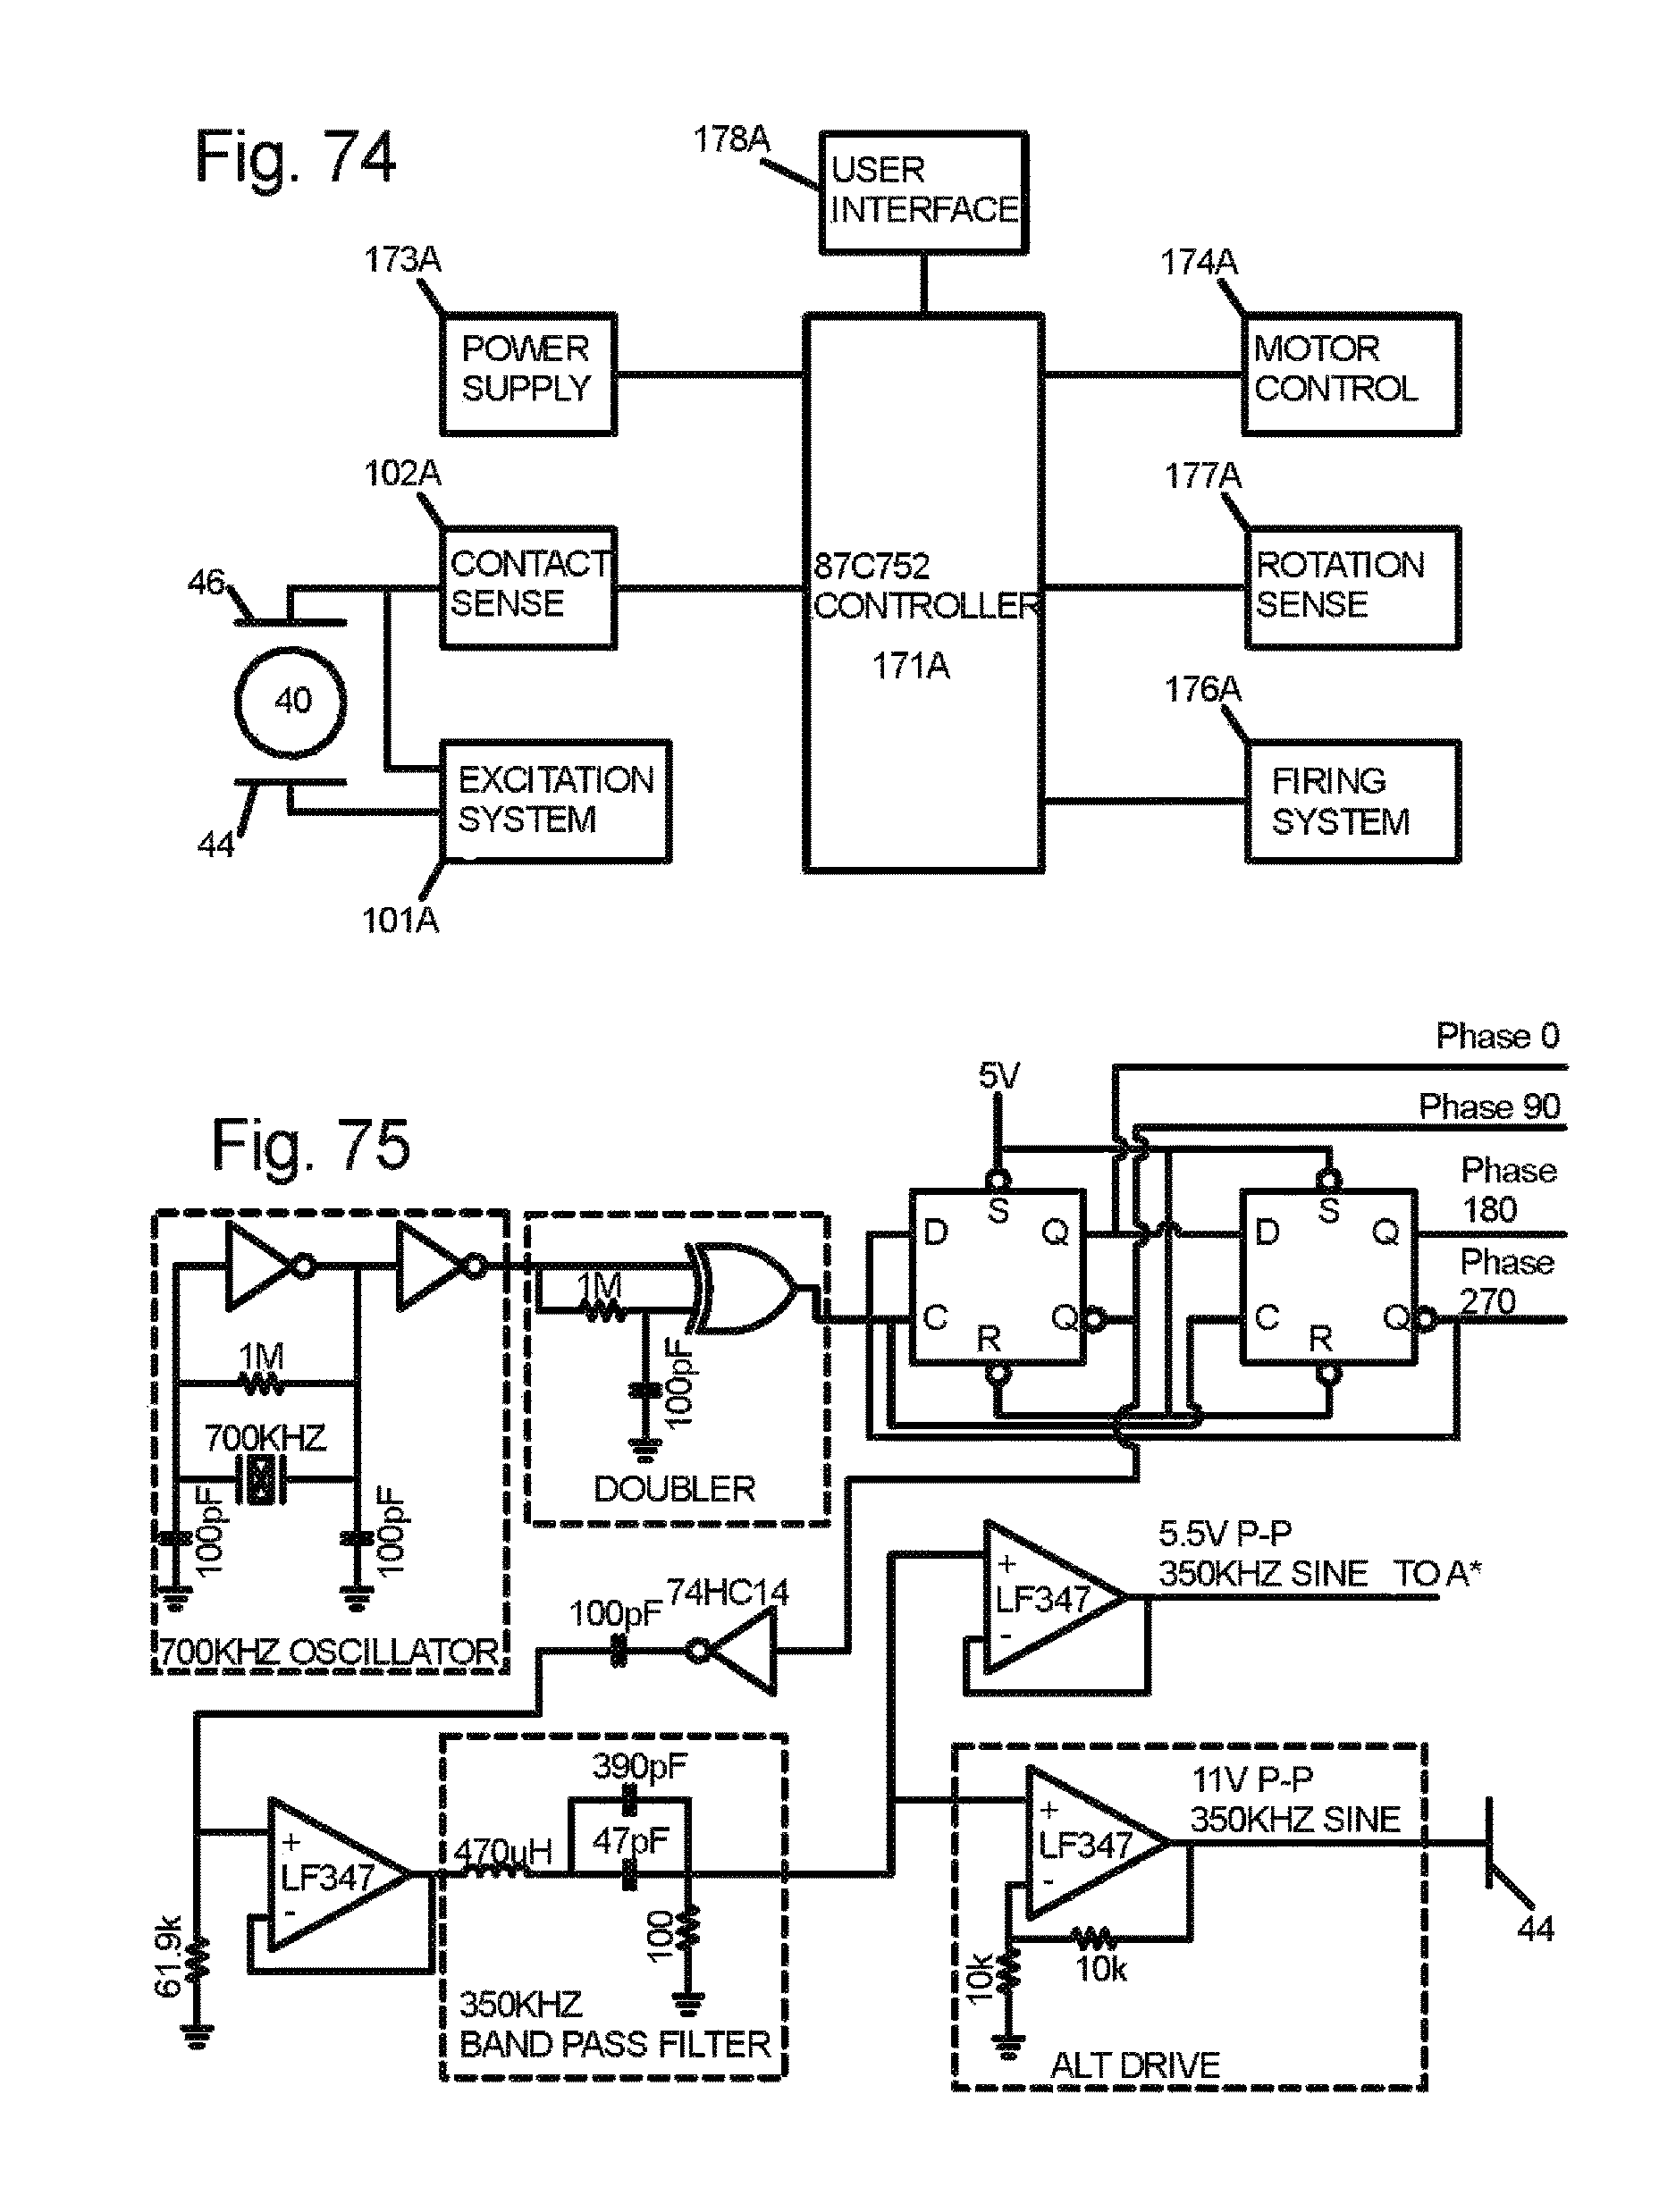 patent us 9 969 014 b2 Wiring Schematics petitions